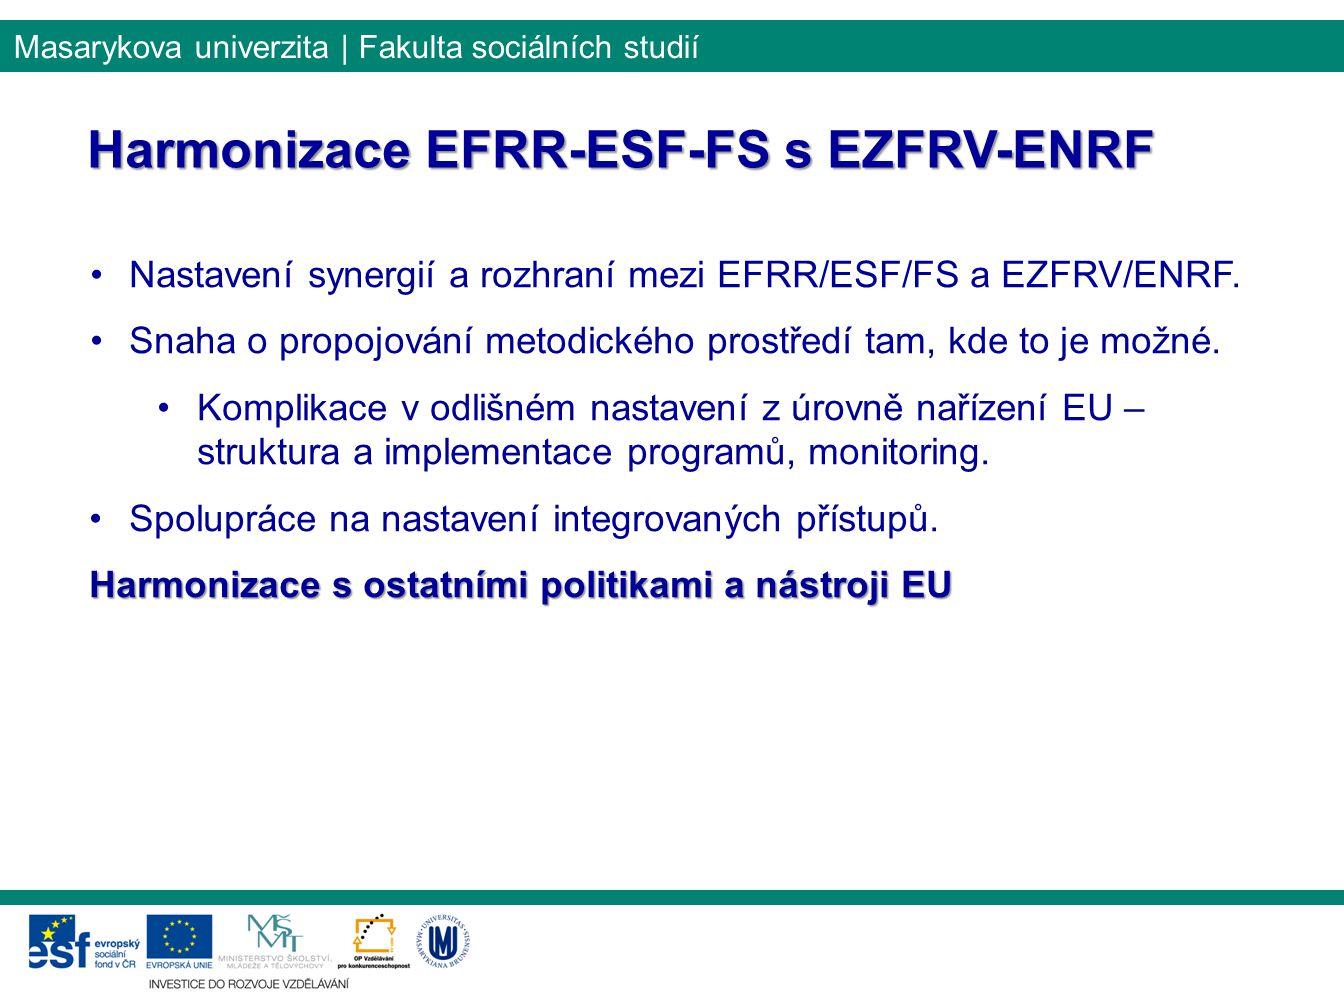 Masarykova univerzita | Fakulta sociálních studií Harmonizace EFRR-ESF-FS s EZFRV-ENRF Nastavení synergií a rozhraní mezi EFRR/ESF/FS a EZFRV/ENRF. Sn